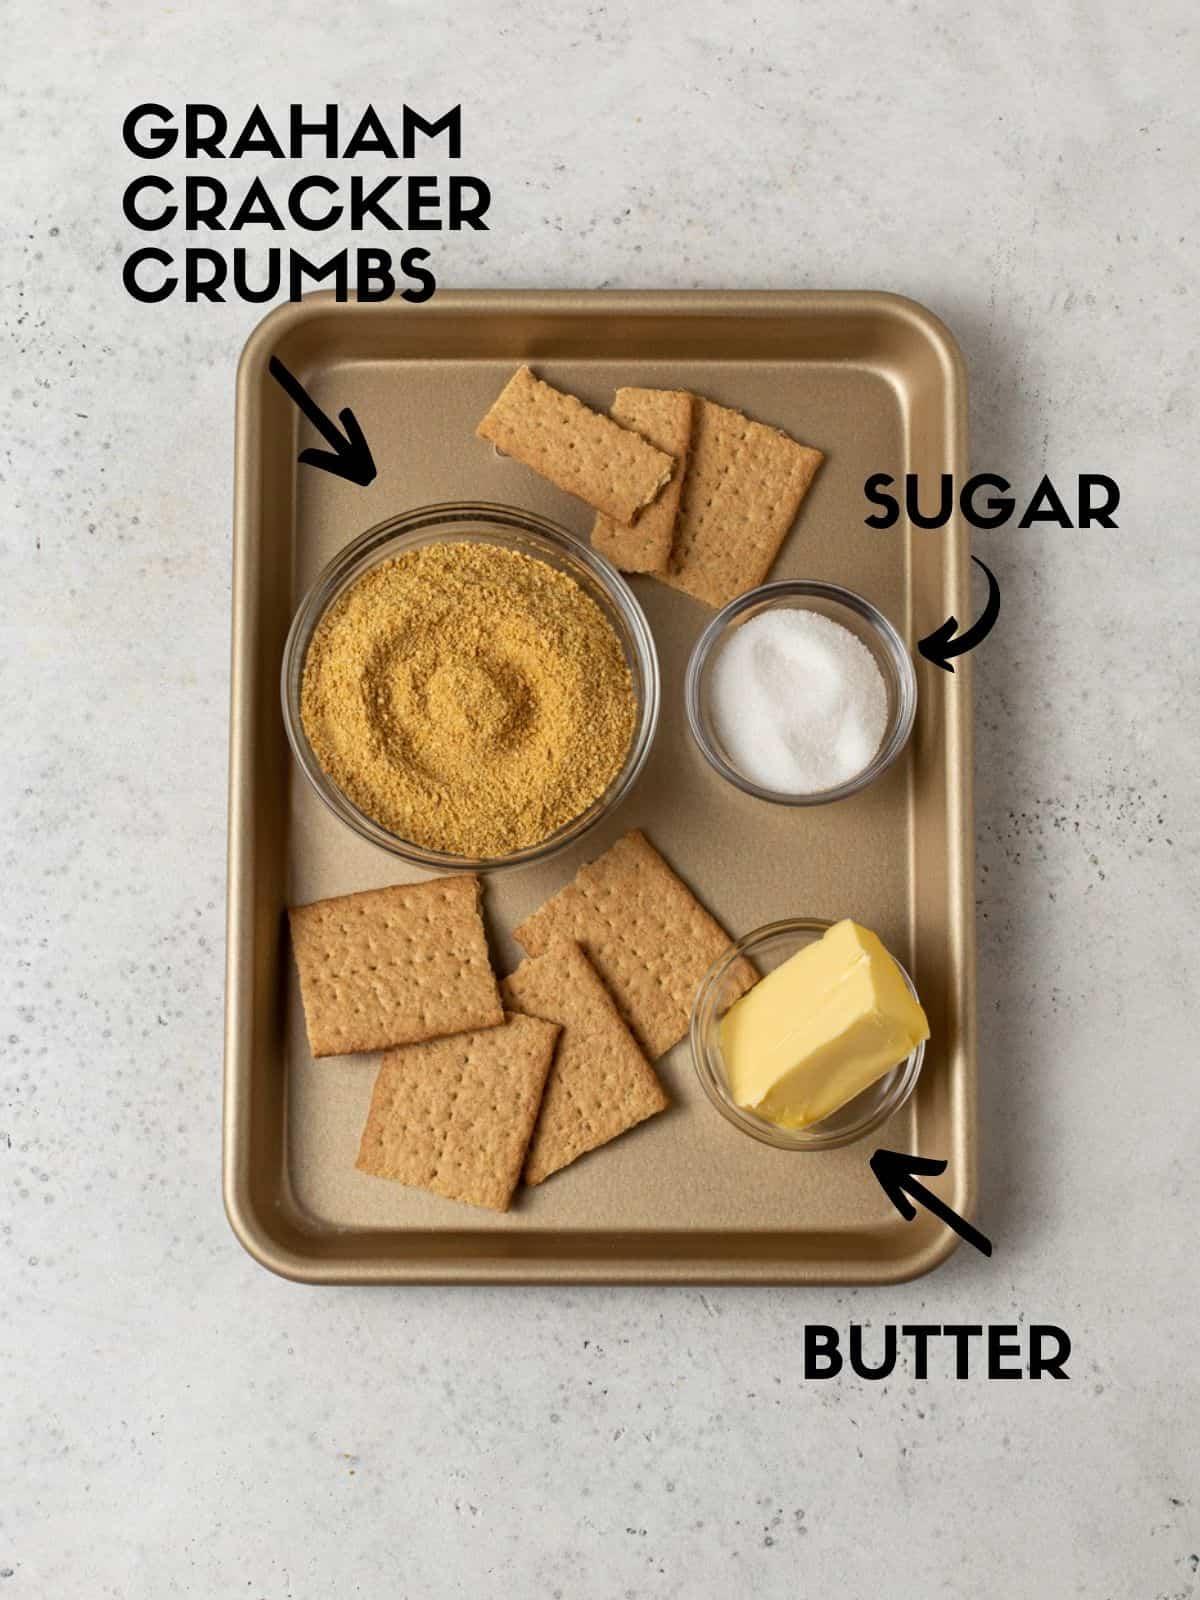 Ingredients for crust on sheet pan.